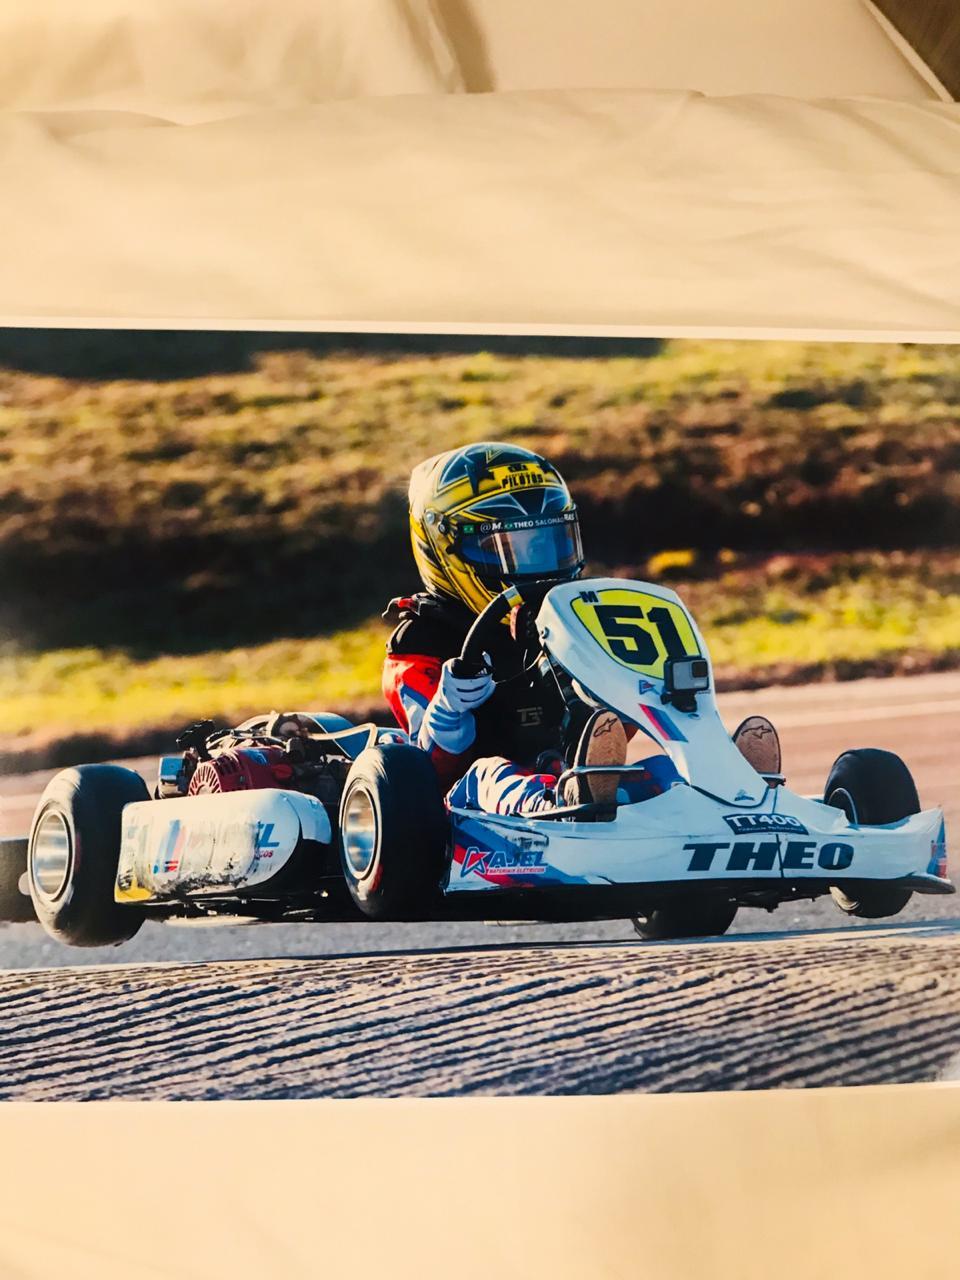 Theo Salomao_rodas&motores 01